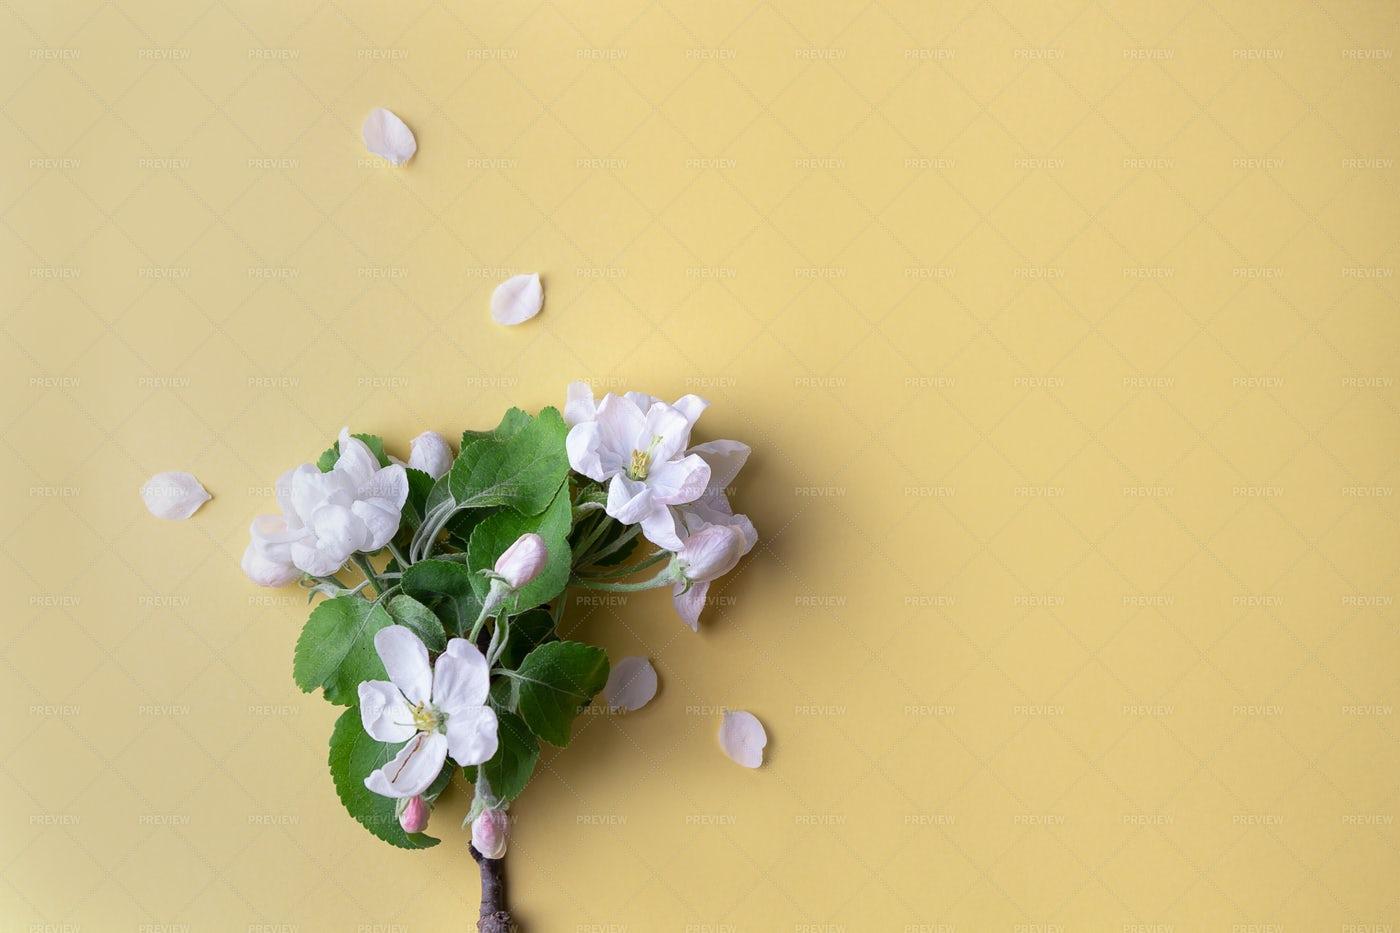 Sprig Of An Apple Tree: Stock Photos